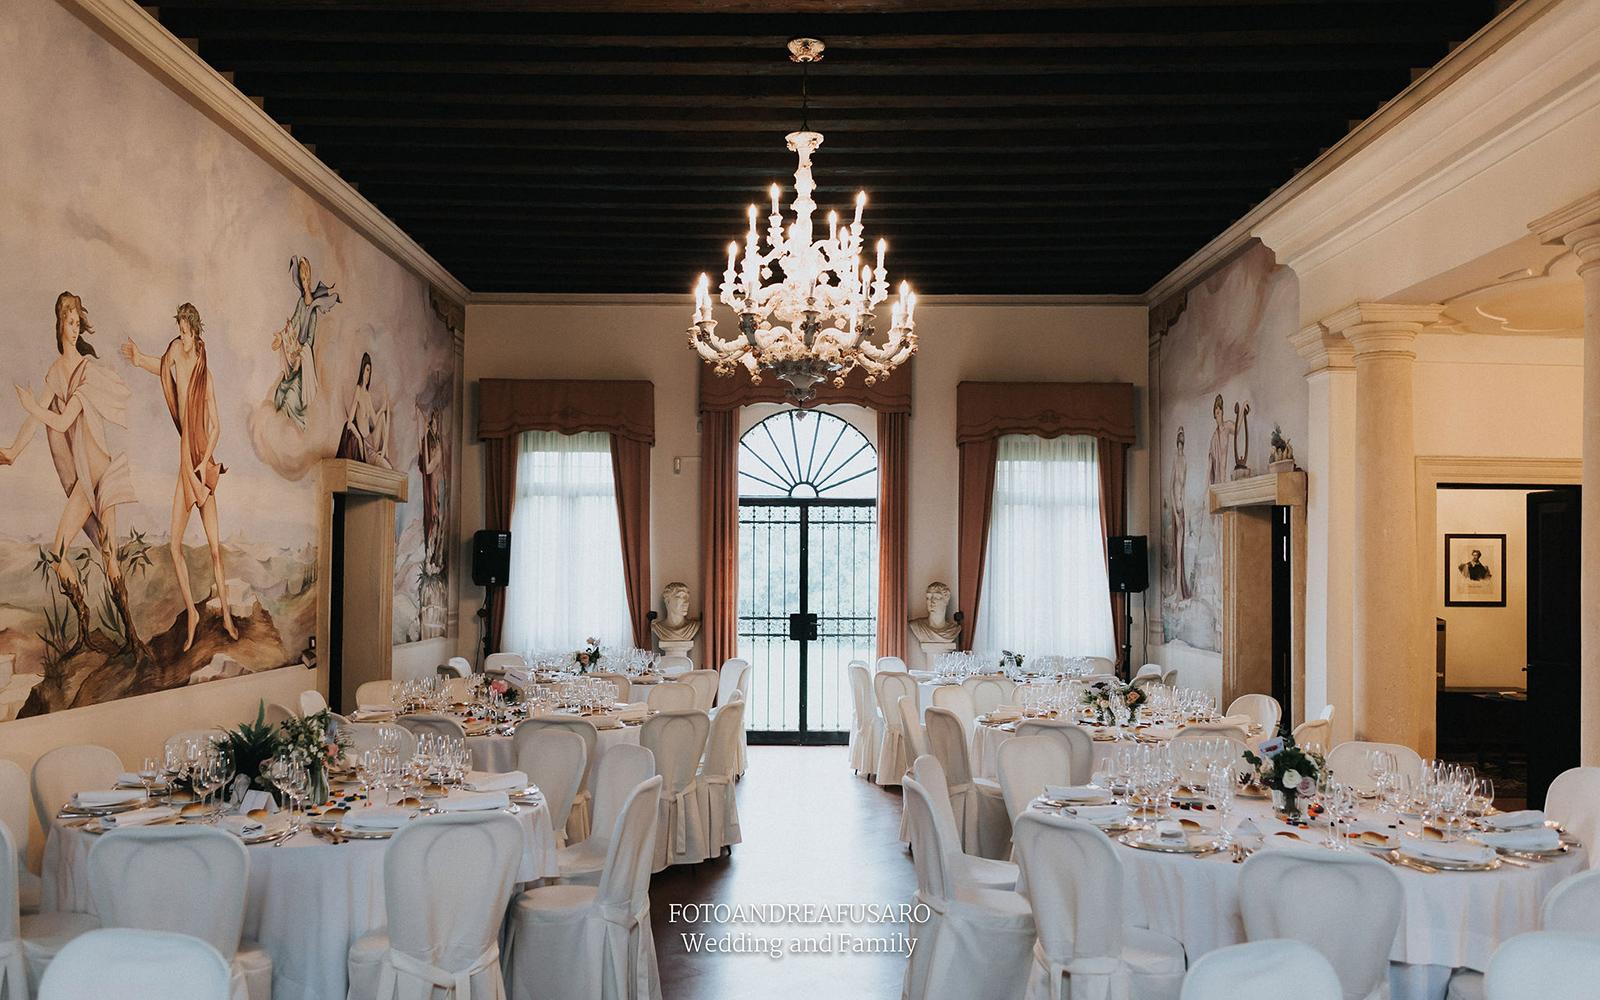 sala ricevimento matrimoni, Sala ricevimento matrimonio, feste di matrimonio Vicenza, feste di matrimonio Padova, Vicenza matrimonio ricevimento , villa per eventi, villa per eventi Vicenza